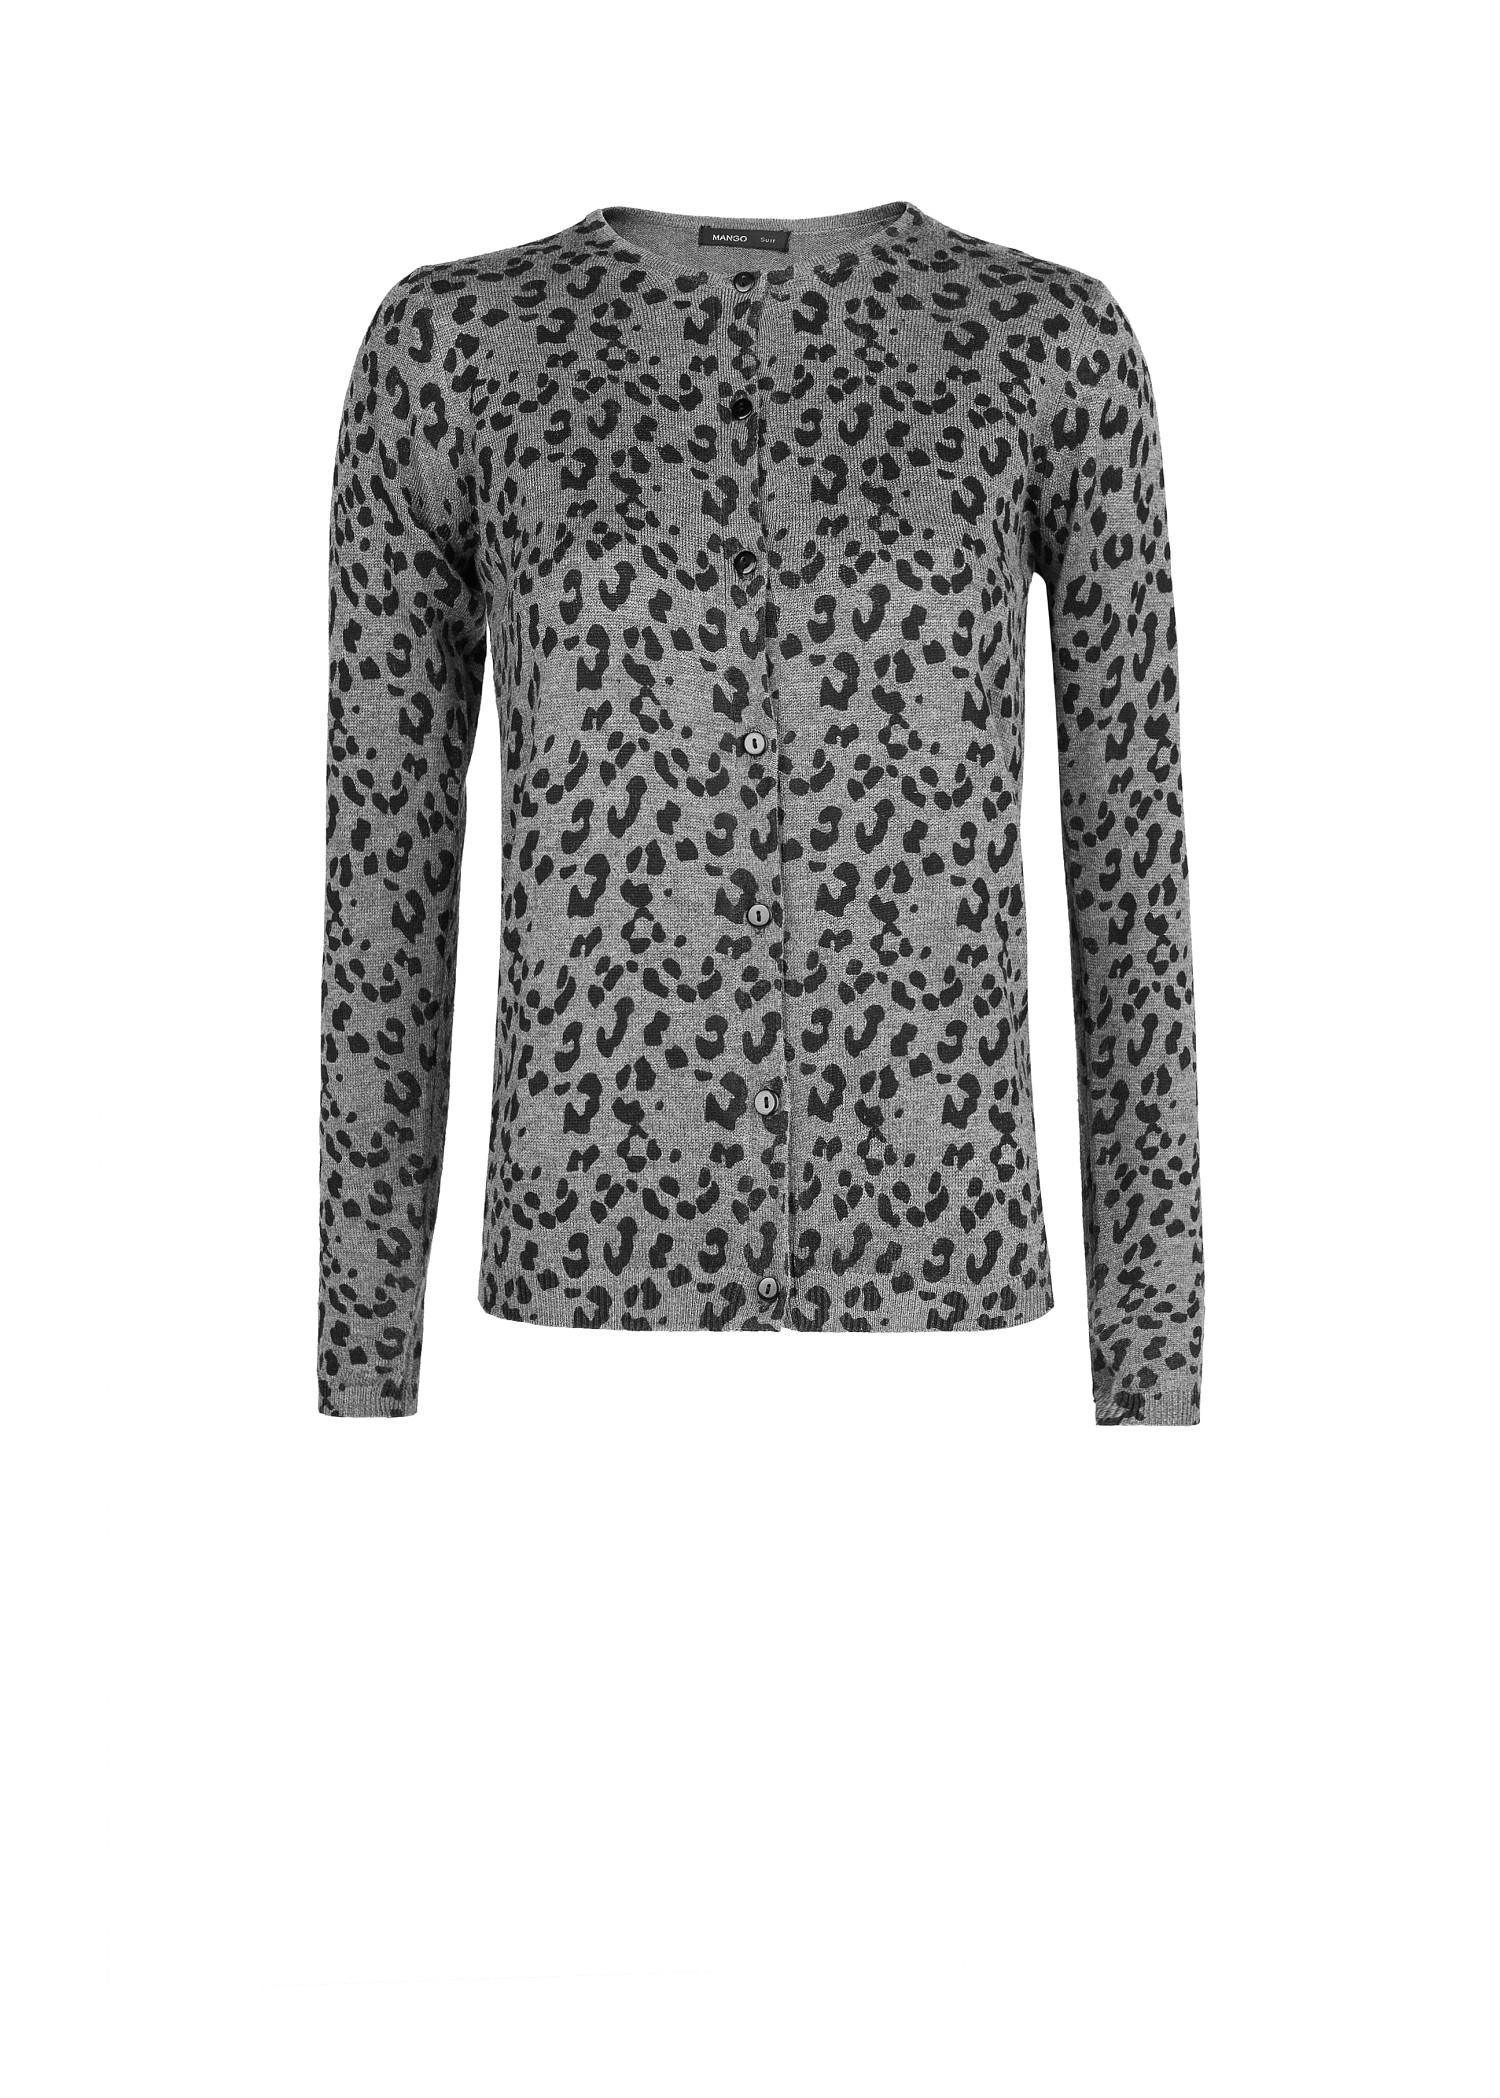 Mango Leopard Print Cardigan in Gray | Lyst